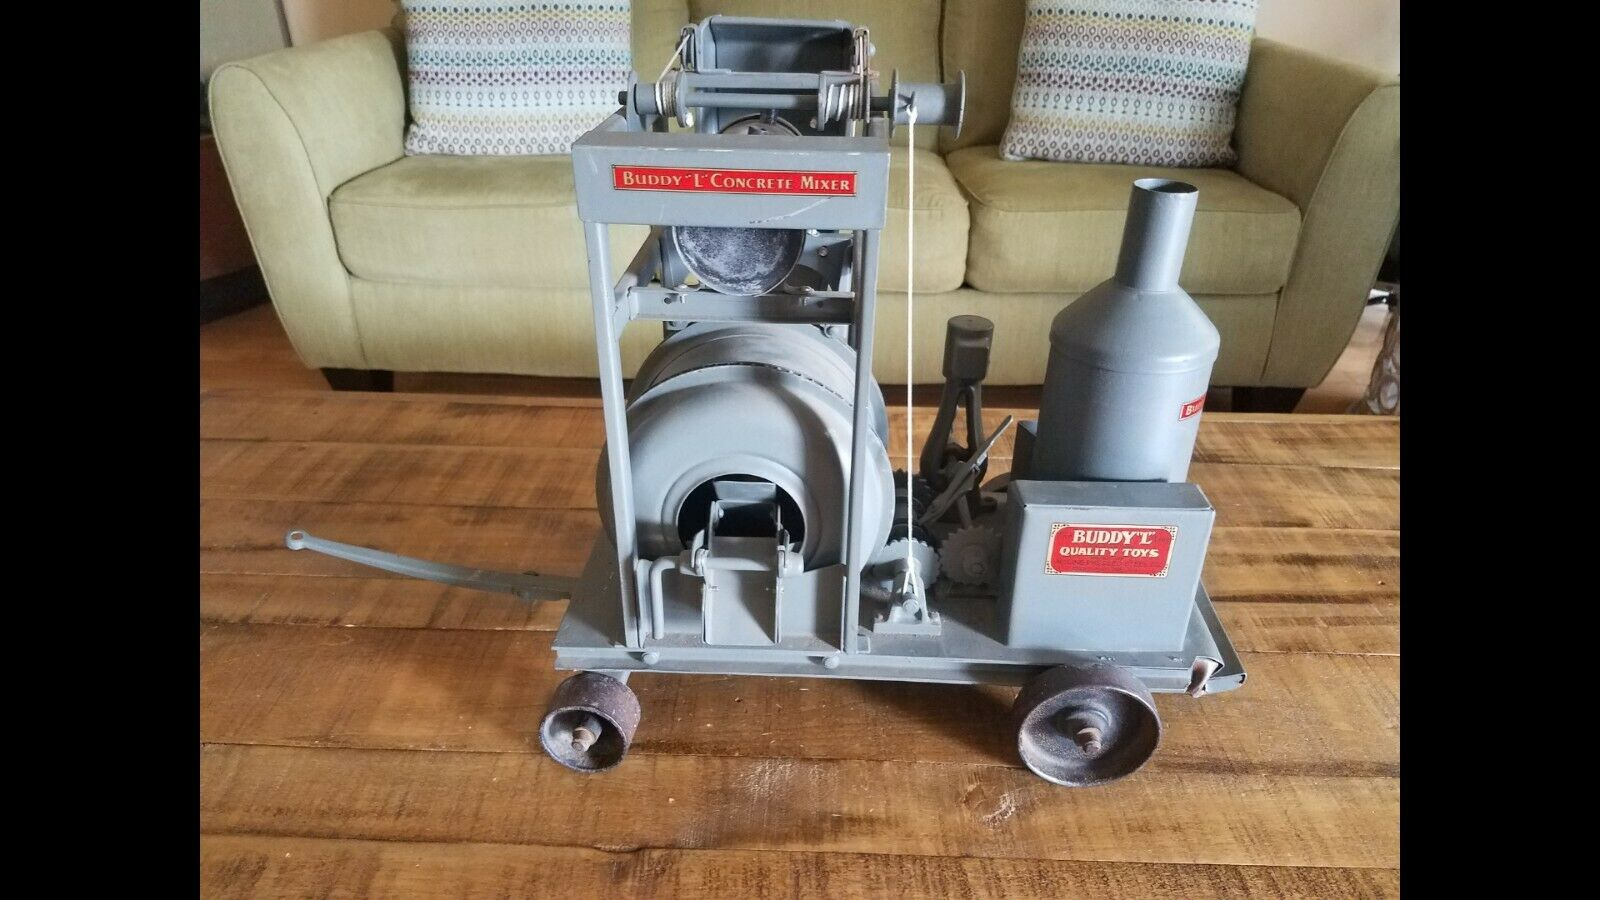 1920's Buddy L Concrete Mixer